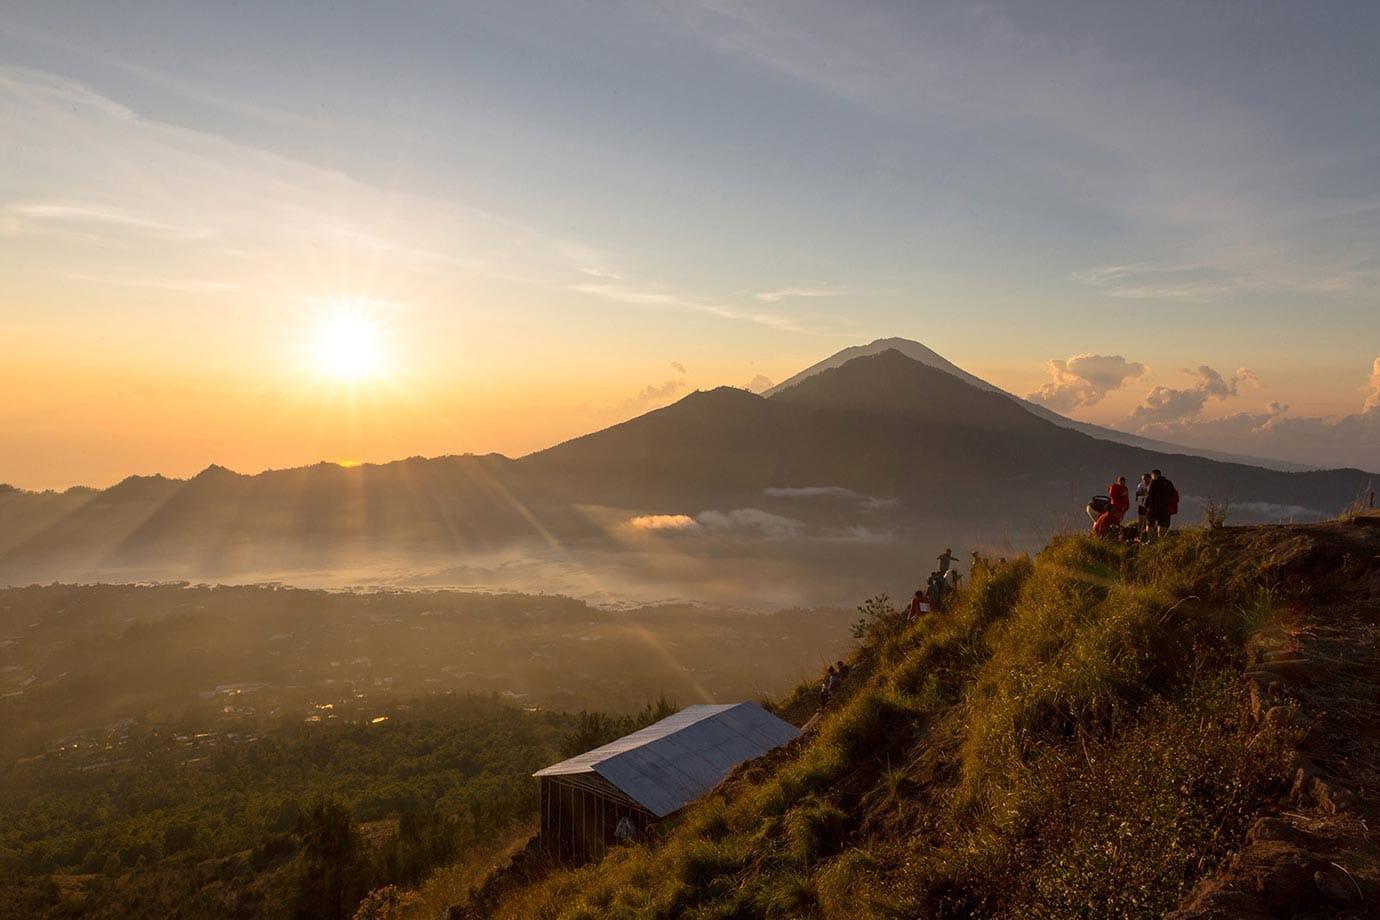 Hiking up Mount Batur for sunrise